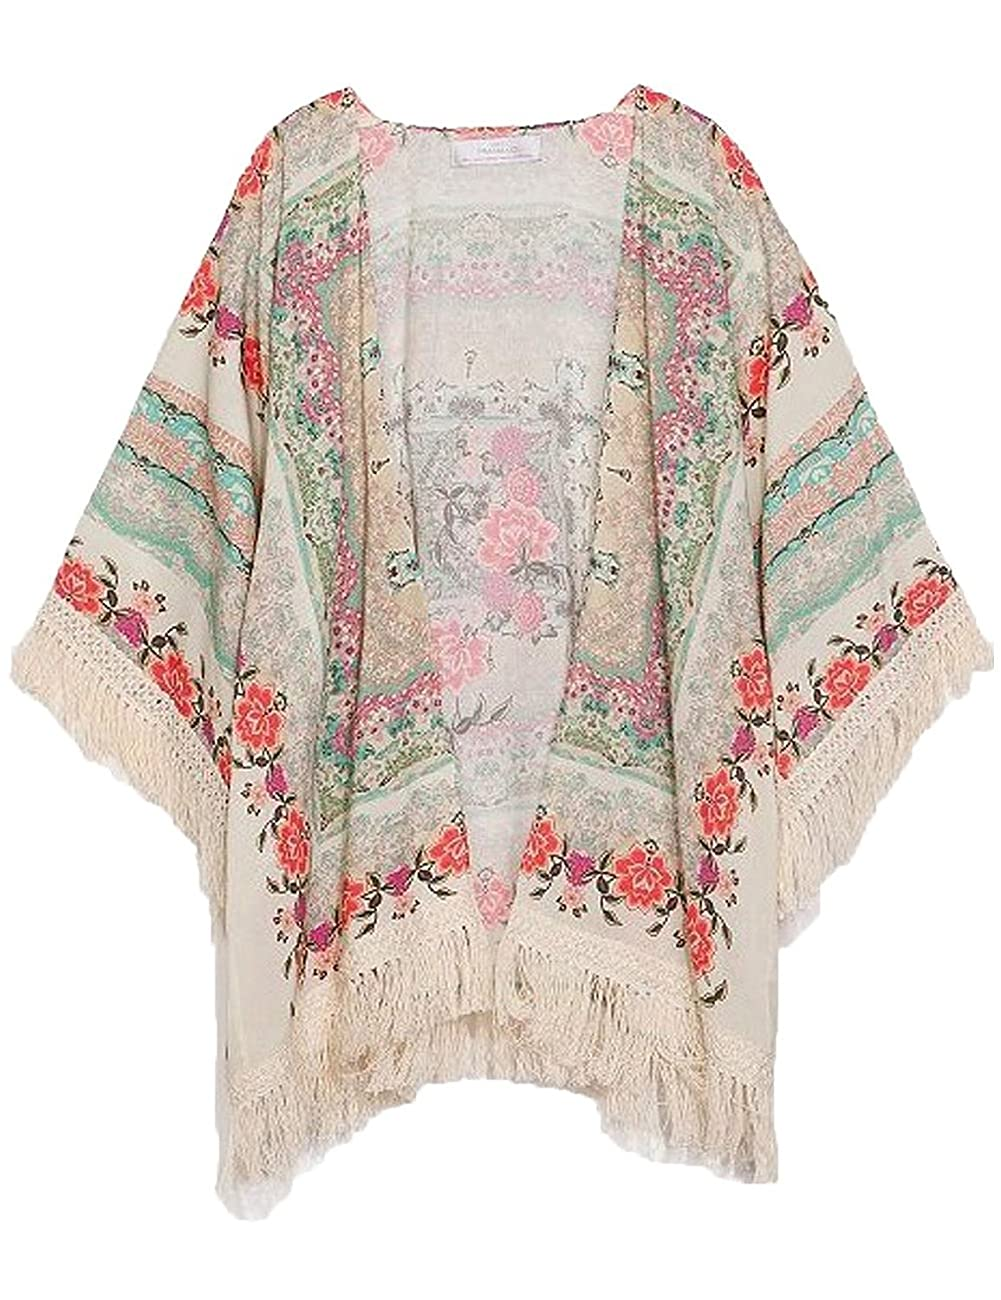 New Vintage Flower Tassels Shawl Cardigan Chiffon Kimono Cardigan Coats Jackets (XL) 0